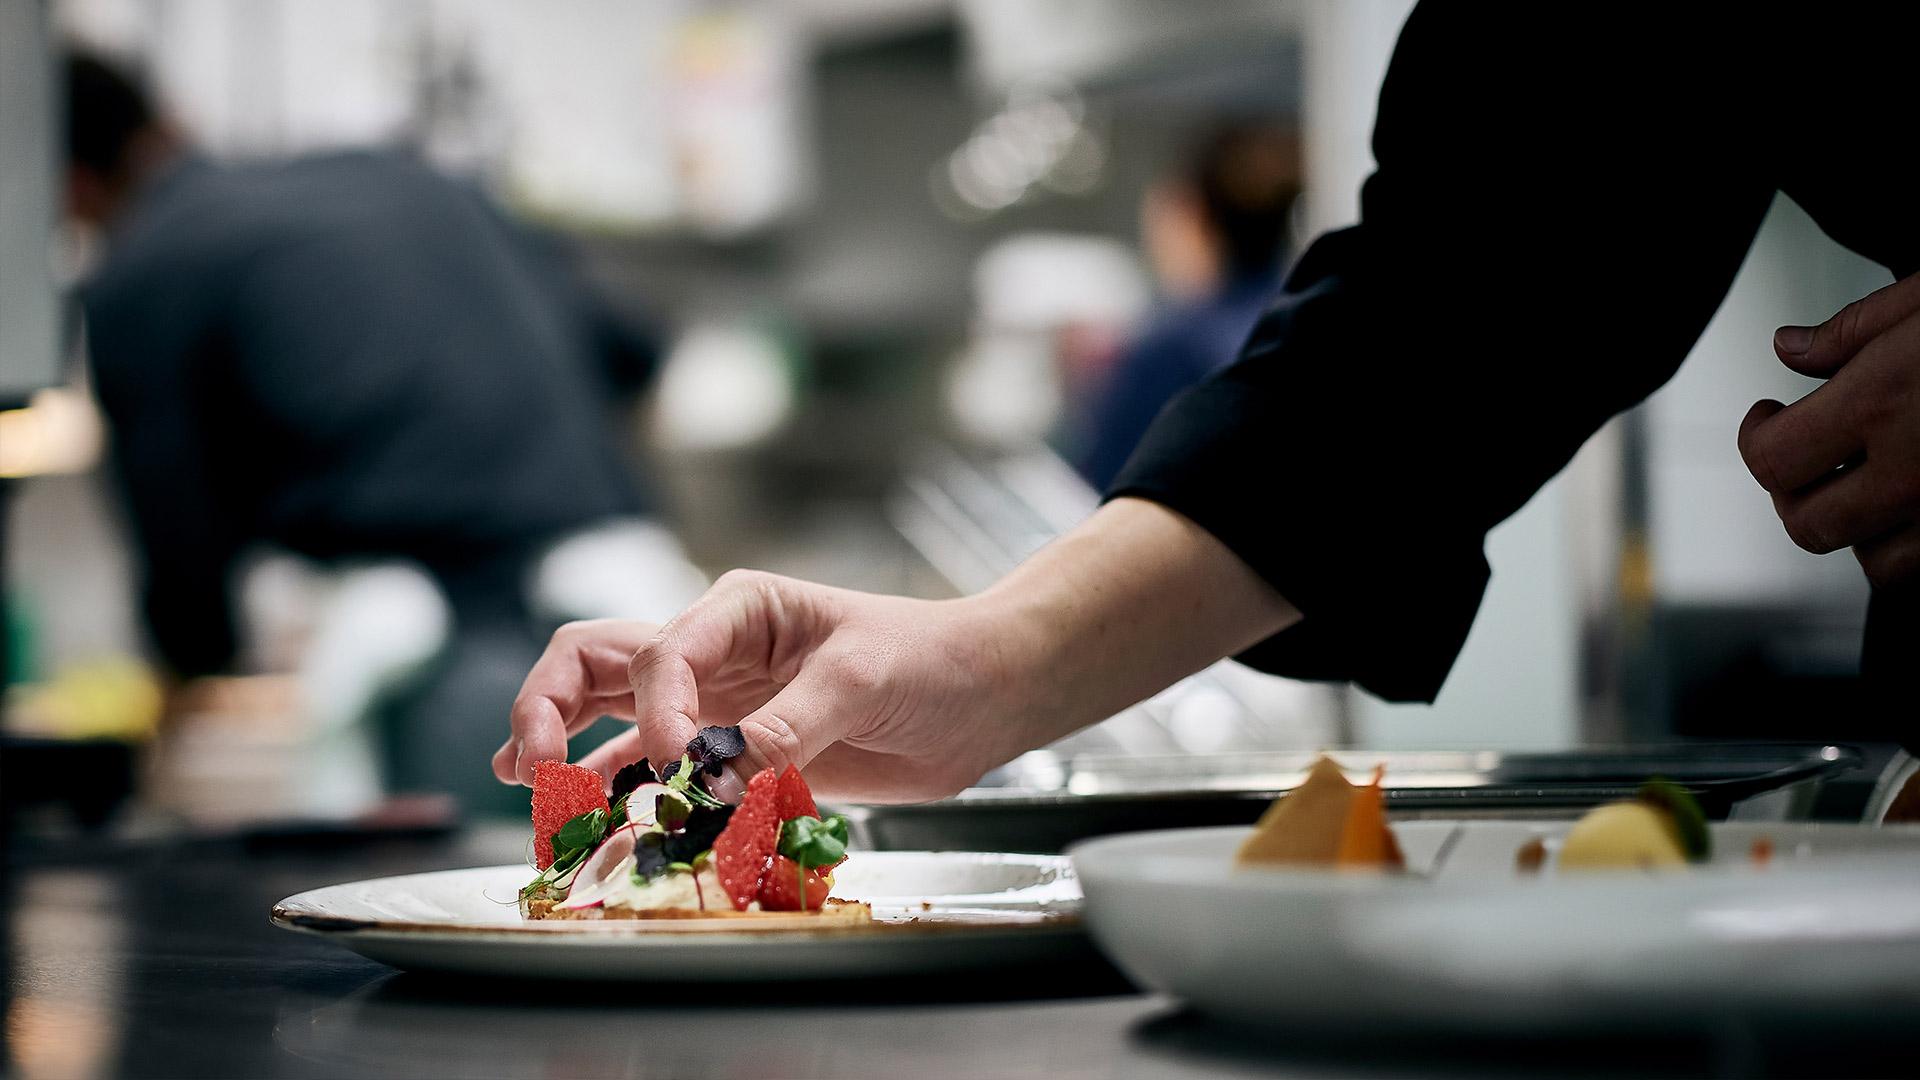 restaurant-belvedere-spiez-kueche-gericht-anrichten.jpg